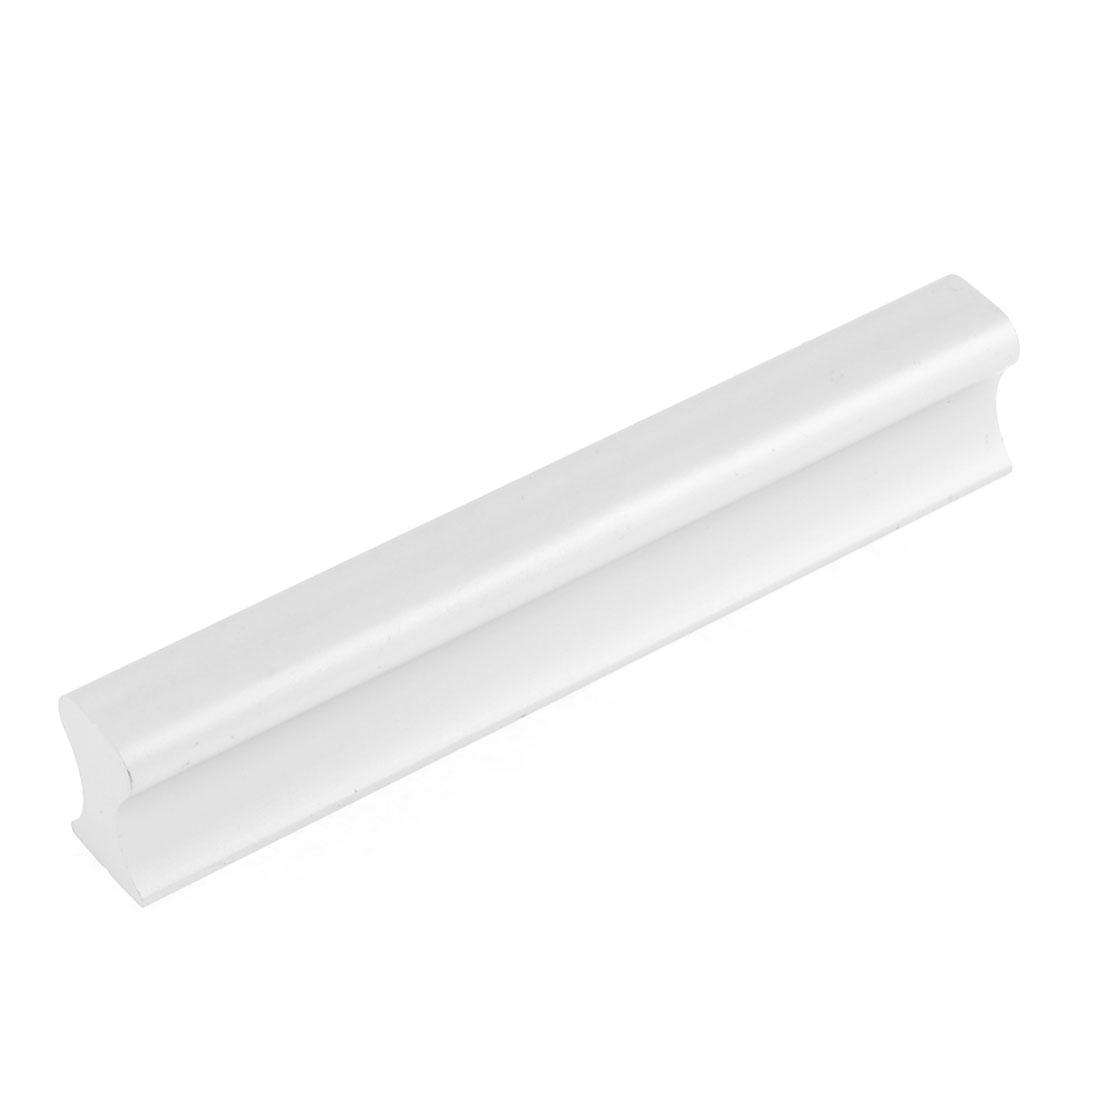 Furniture Sideboard Hardware Aluminum Knob Pull Handle 11cm Long